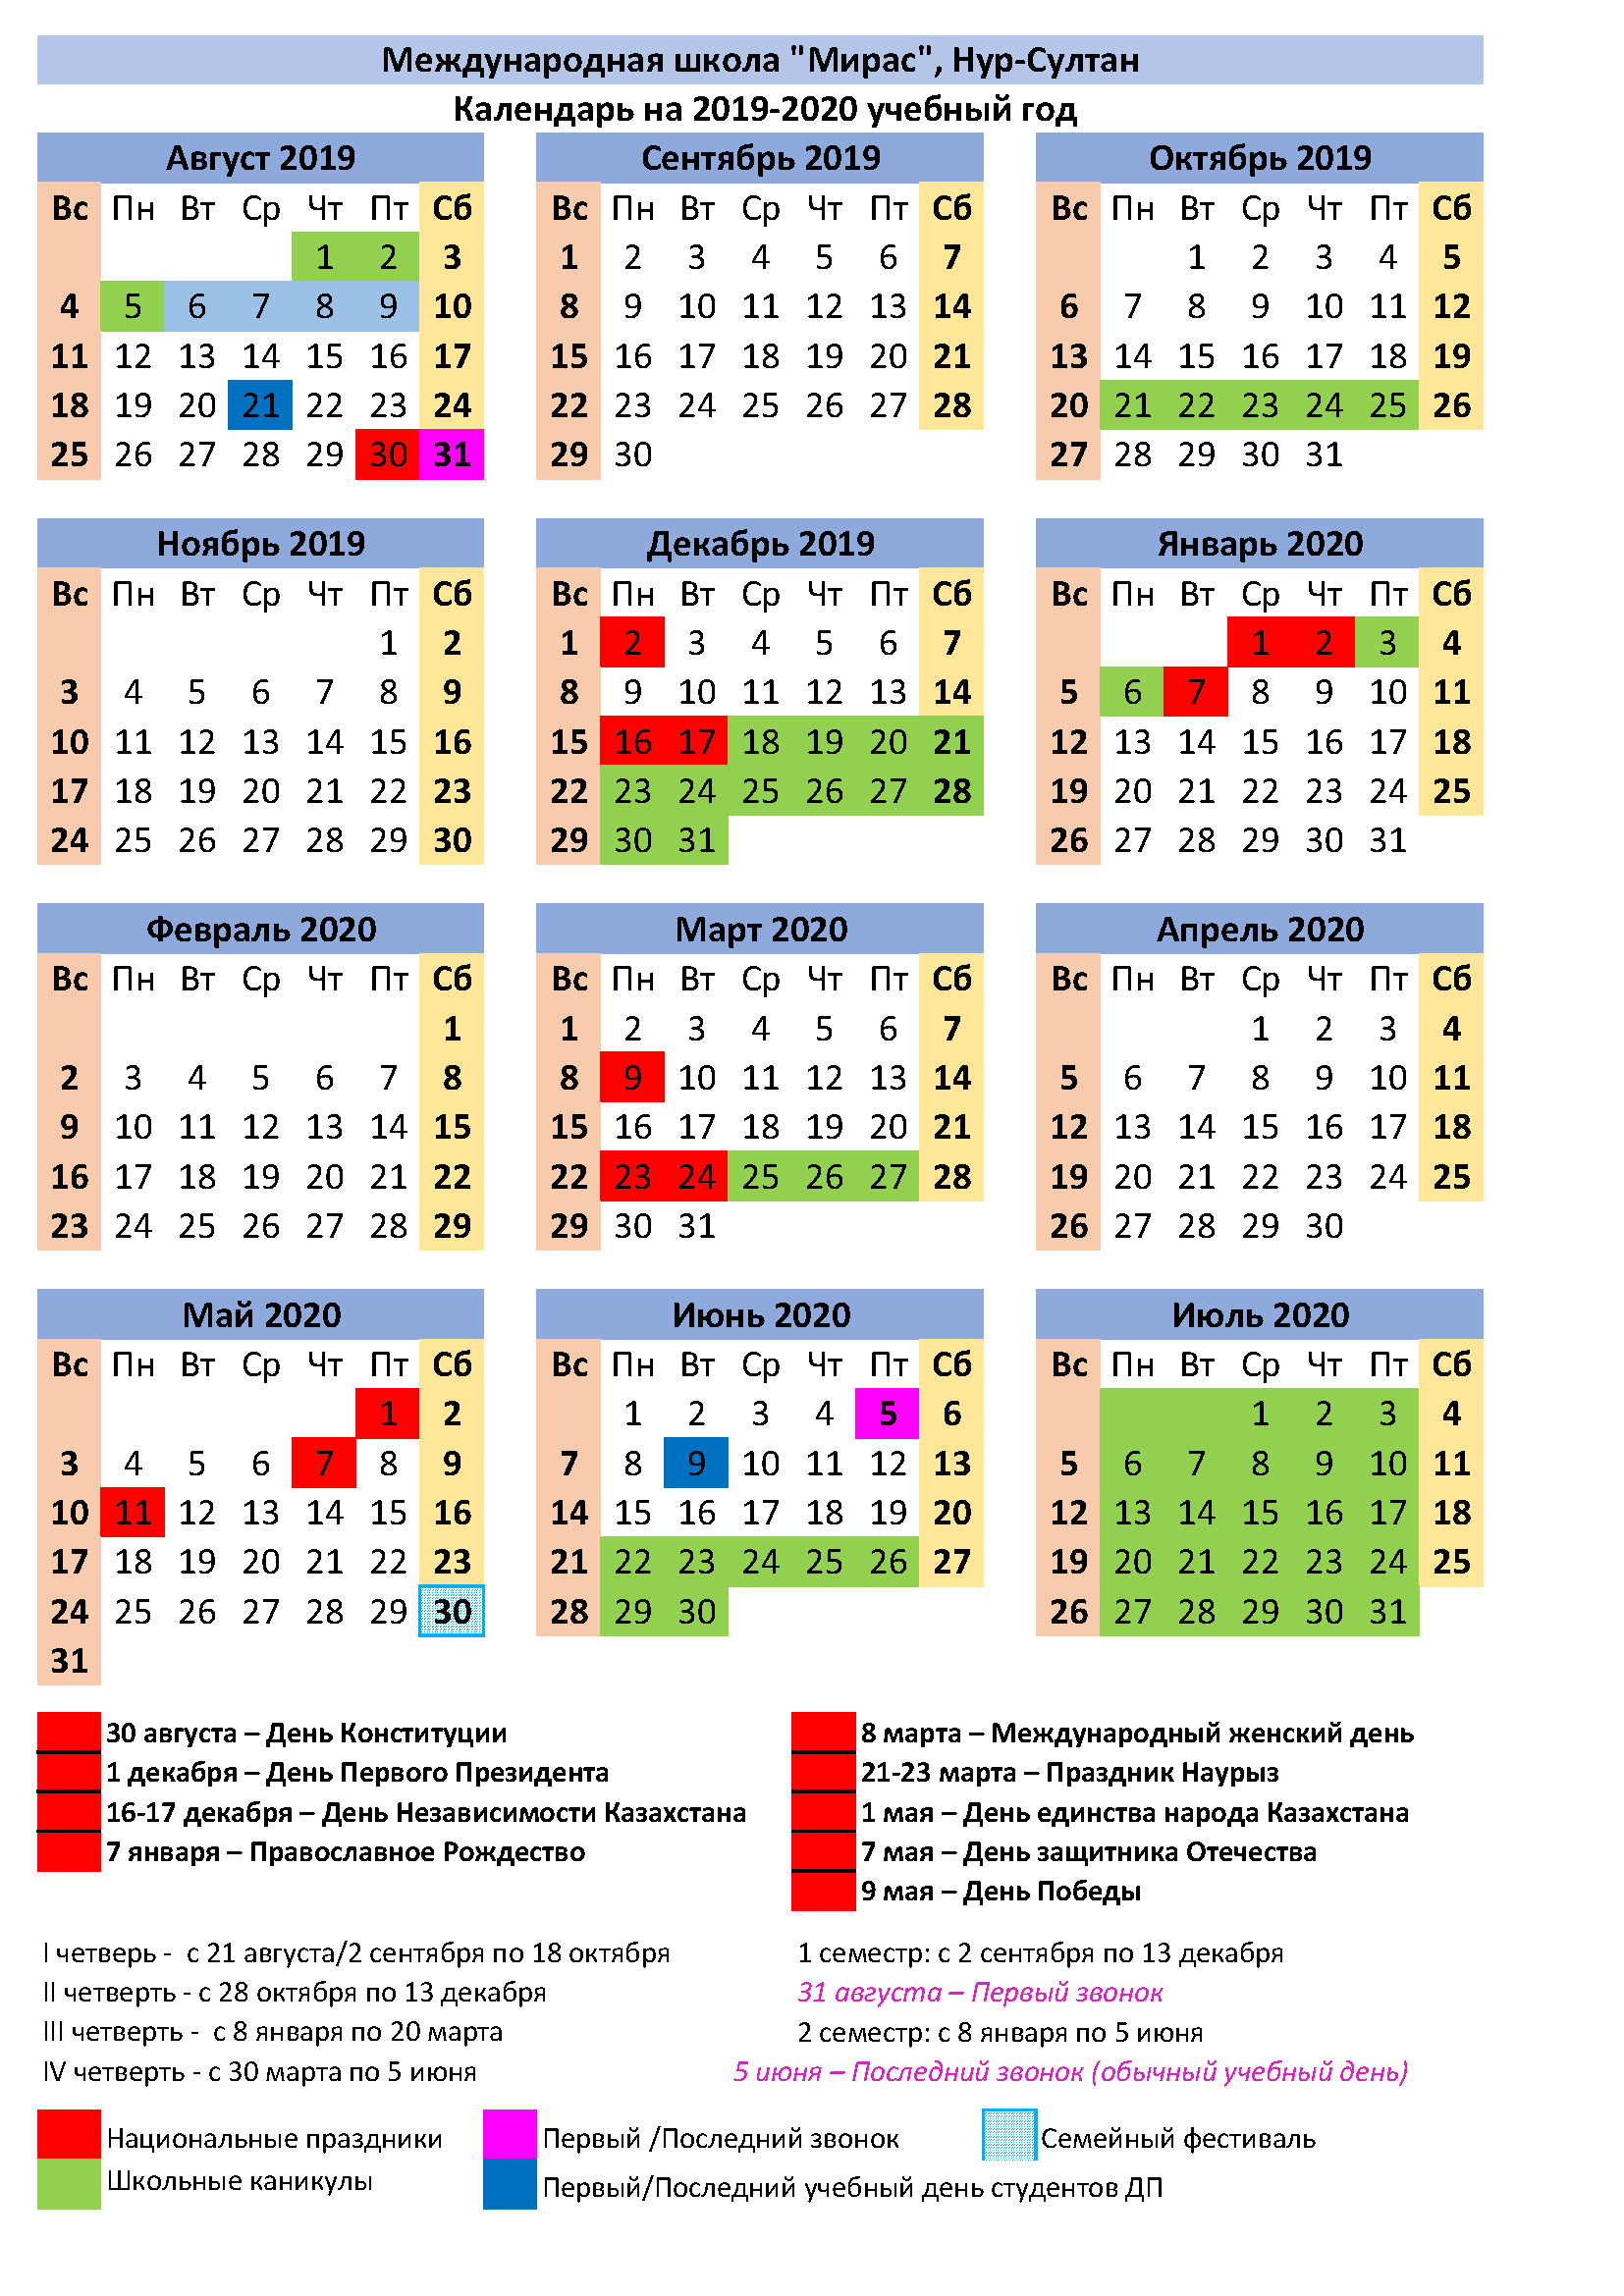 Календарь 2020 Казахстан Праздники  Bagno.site with regard to Maya Calendar 2020